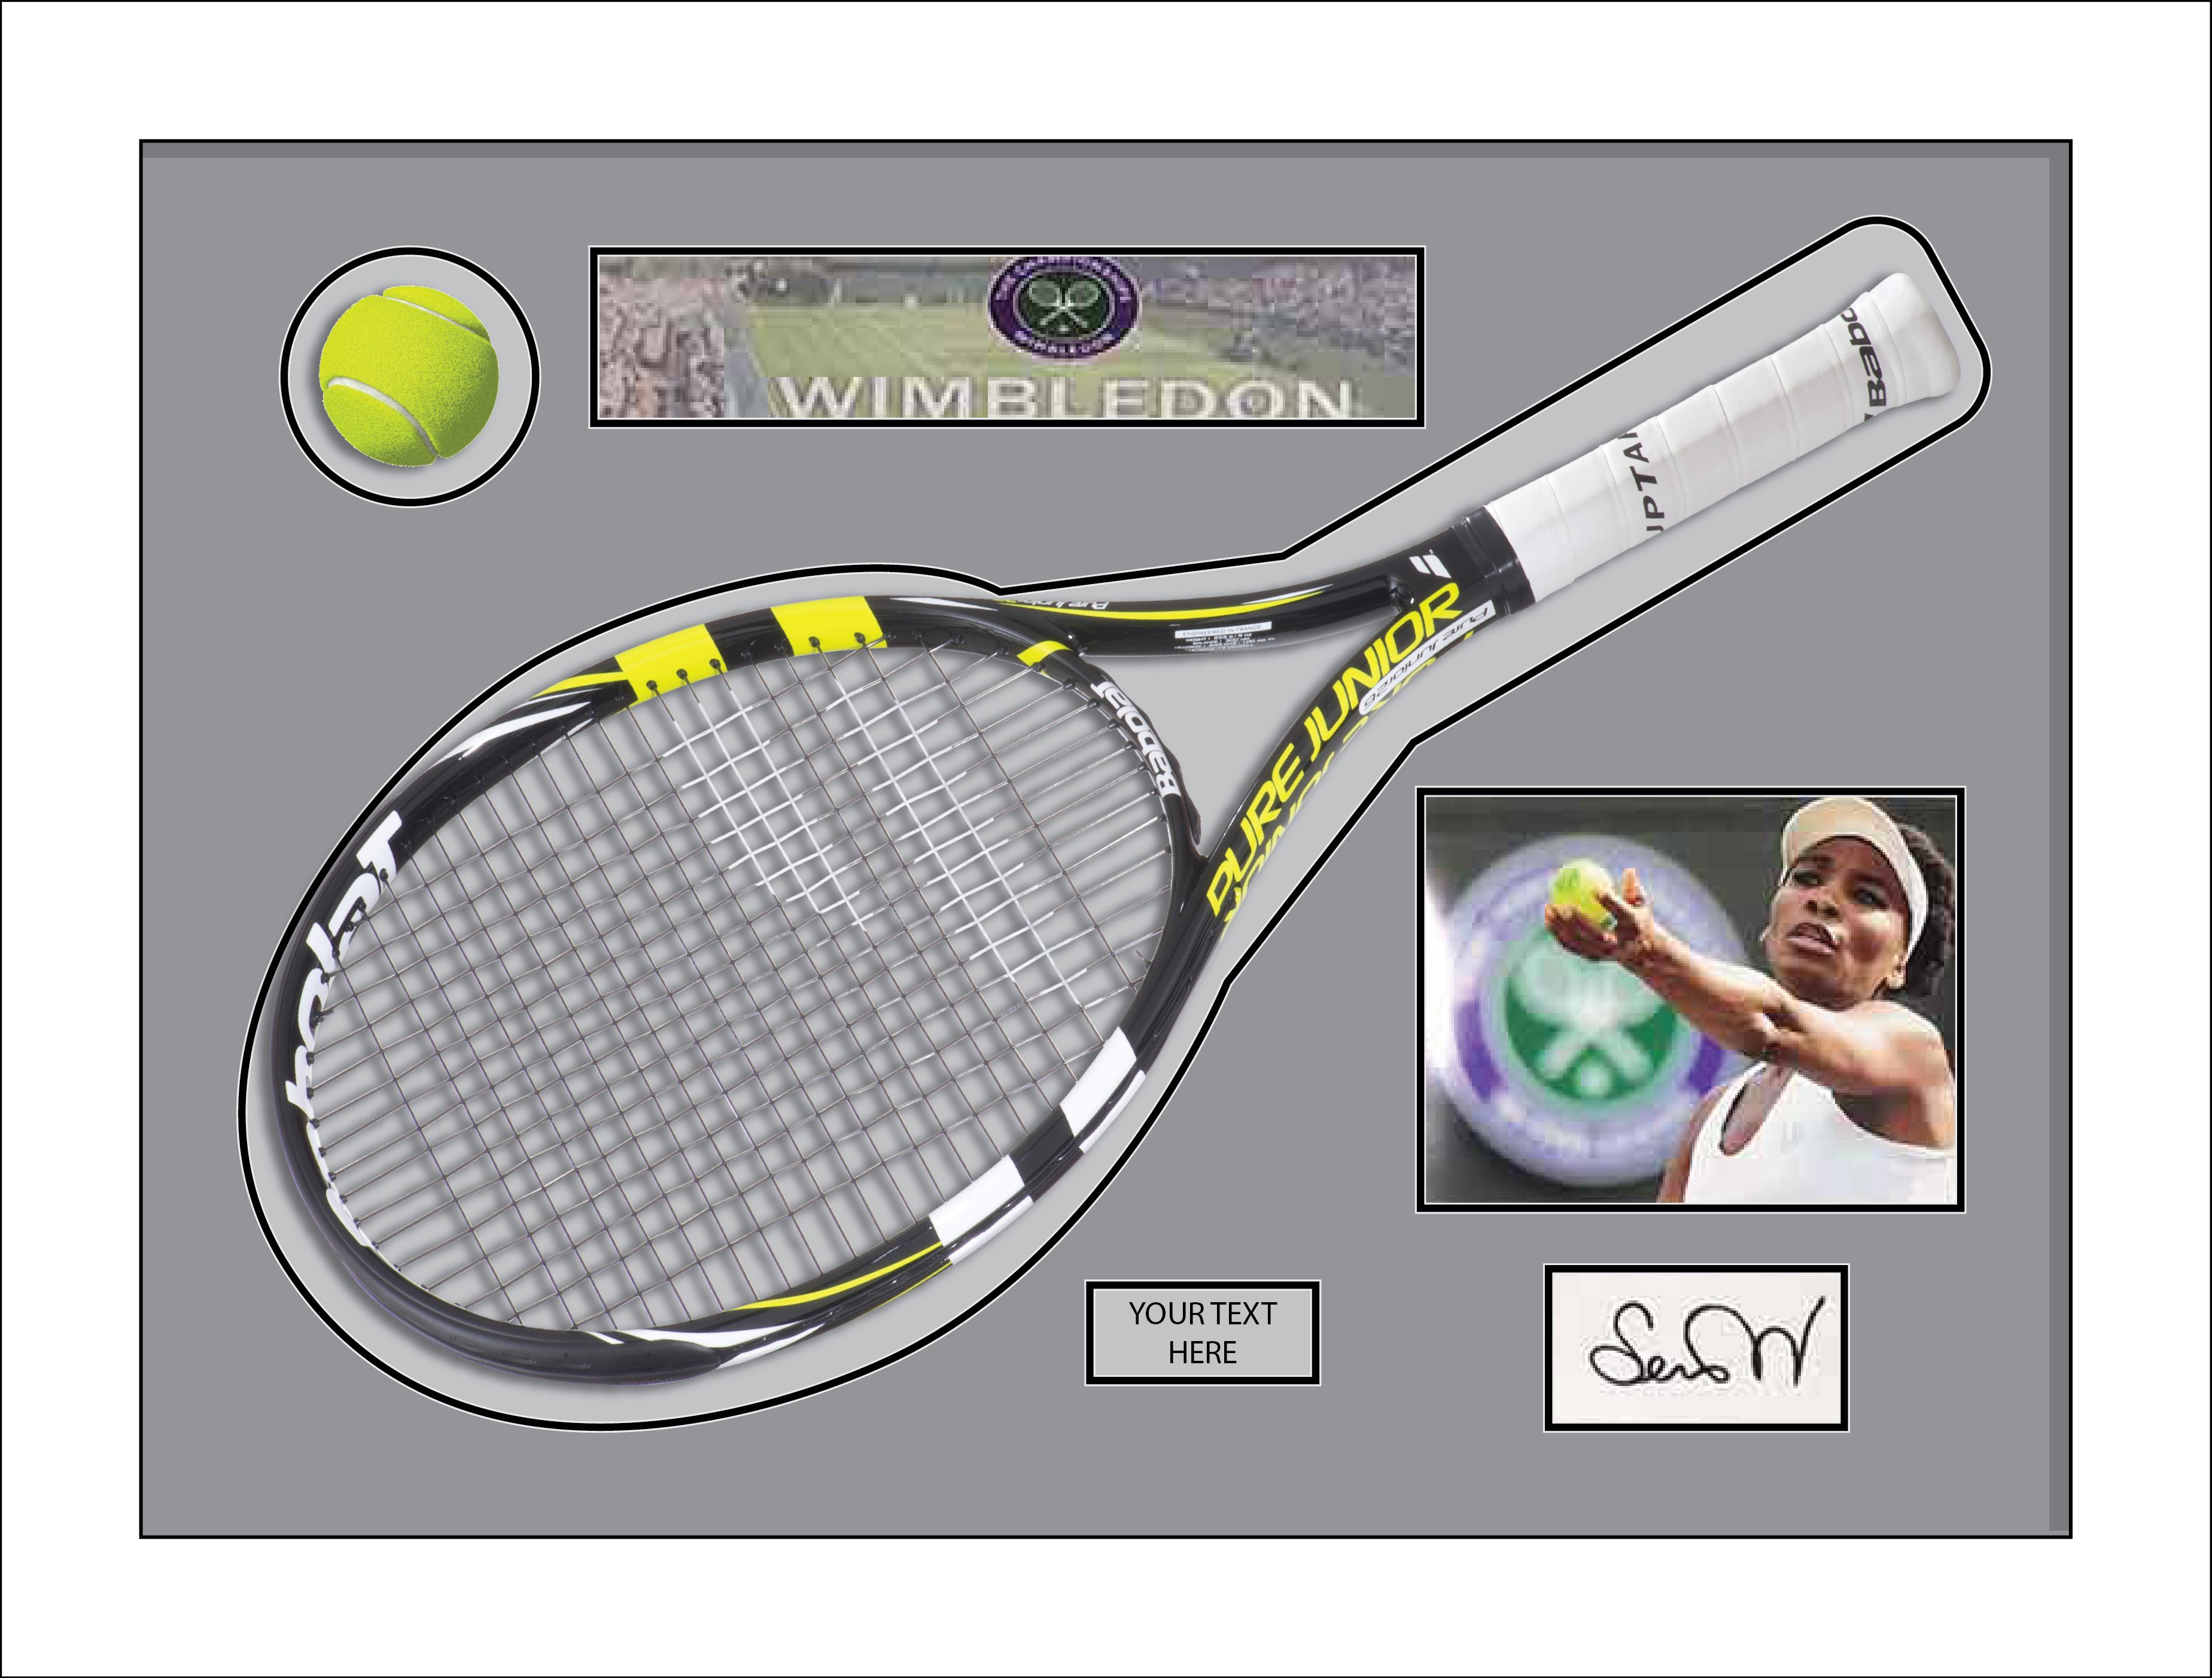 Serena Williams Tennis Memorabilia with tennis ball and bat display case